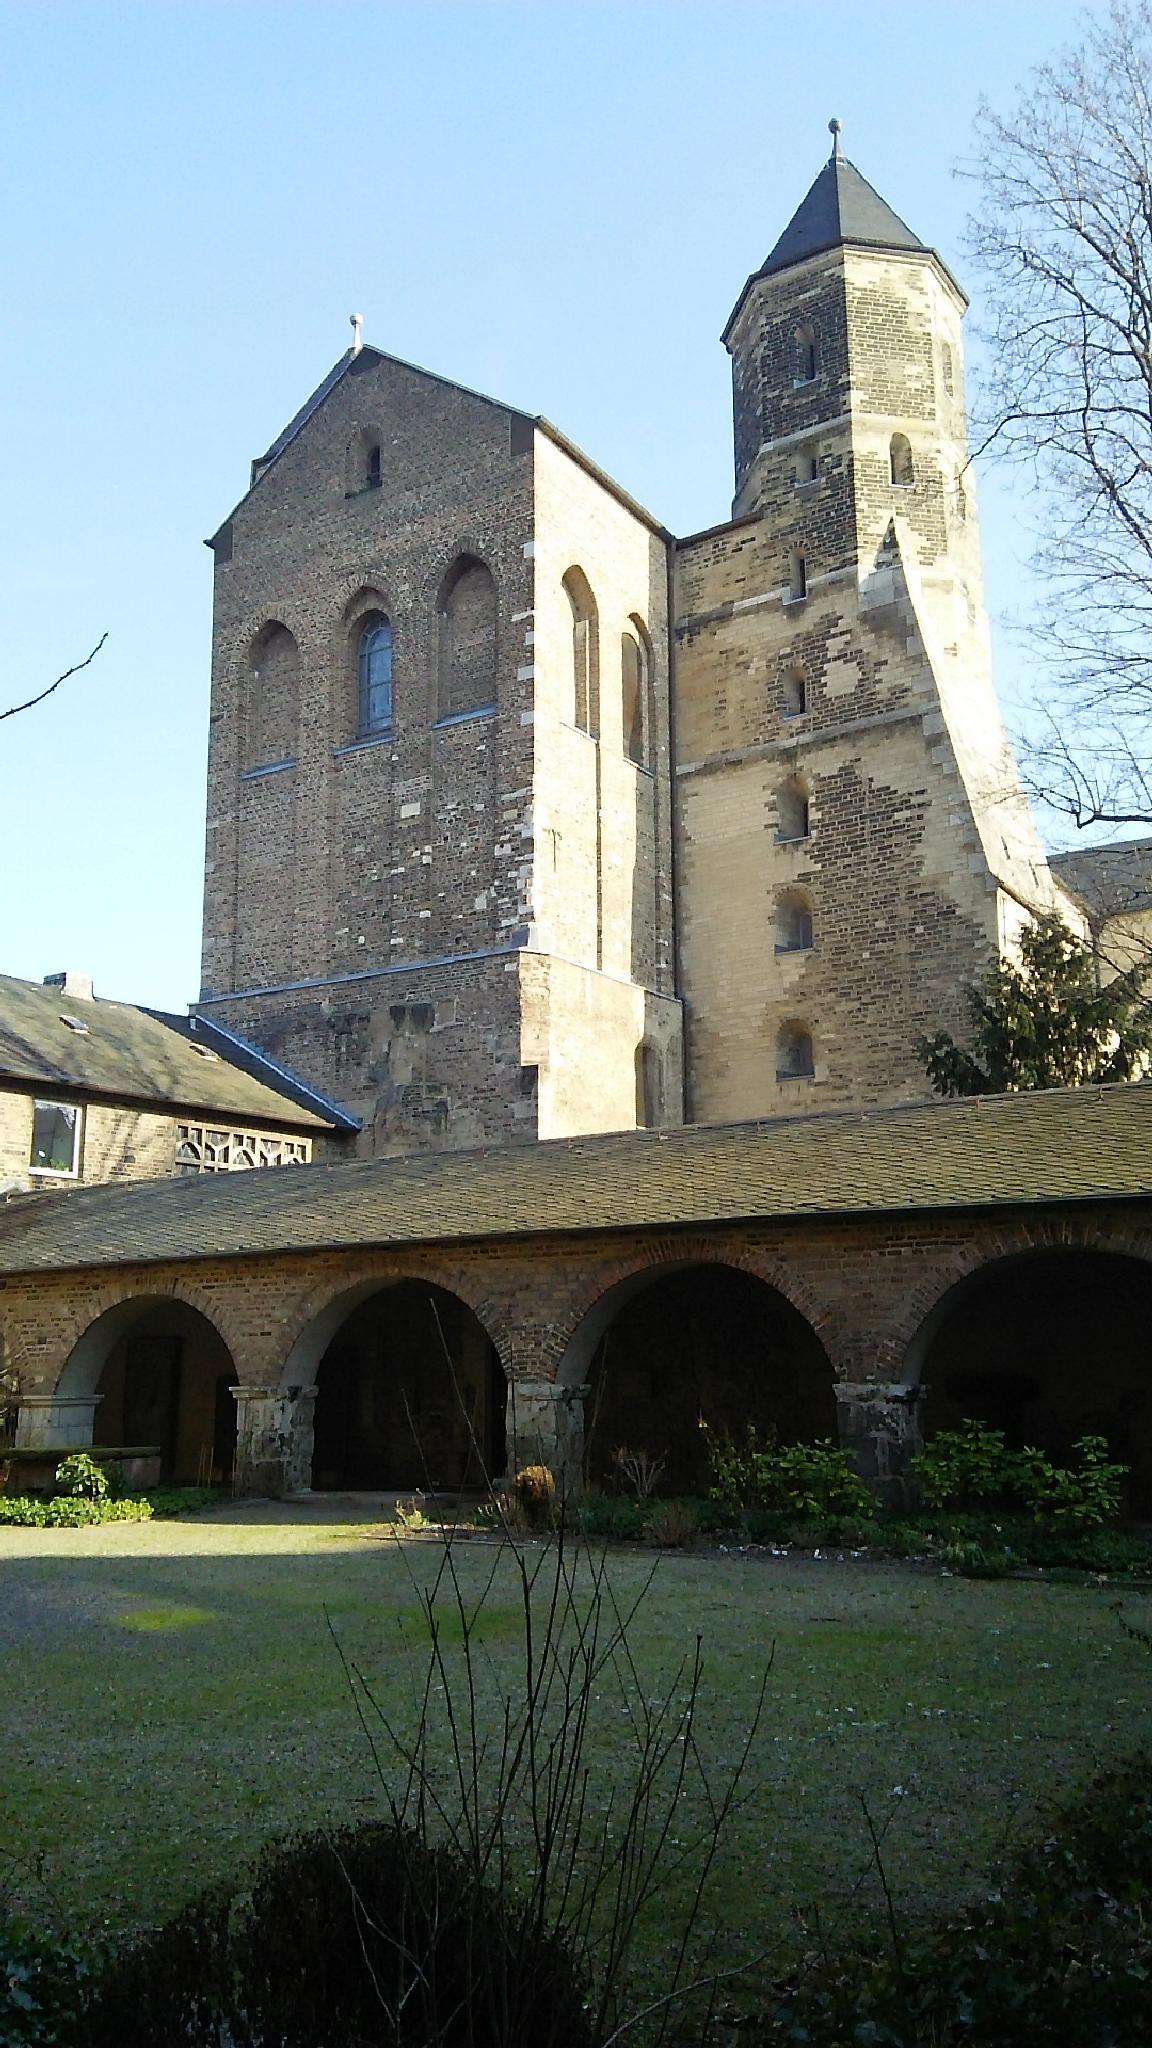 St. Maria im Kapitol Cologne (Köln),  Germany by Biniam YIBALEH BinIAM ቢንያም: ይባልህ (@ gOOglE & facEBook & twittER ). nEvEr rUn nEvEr staY